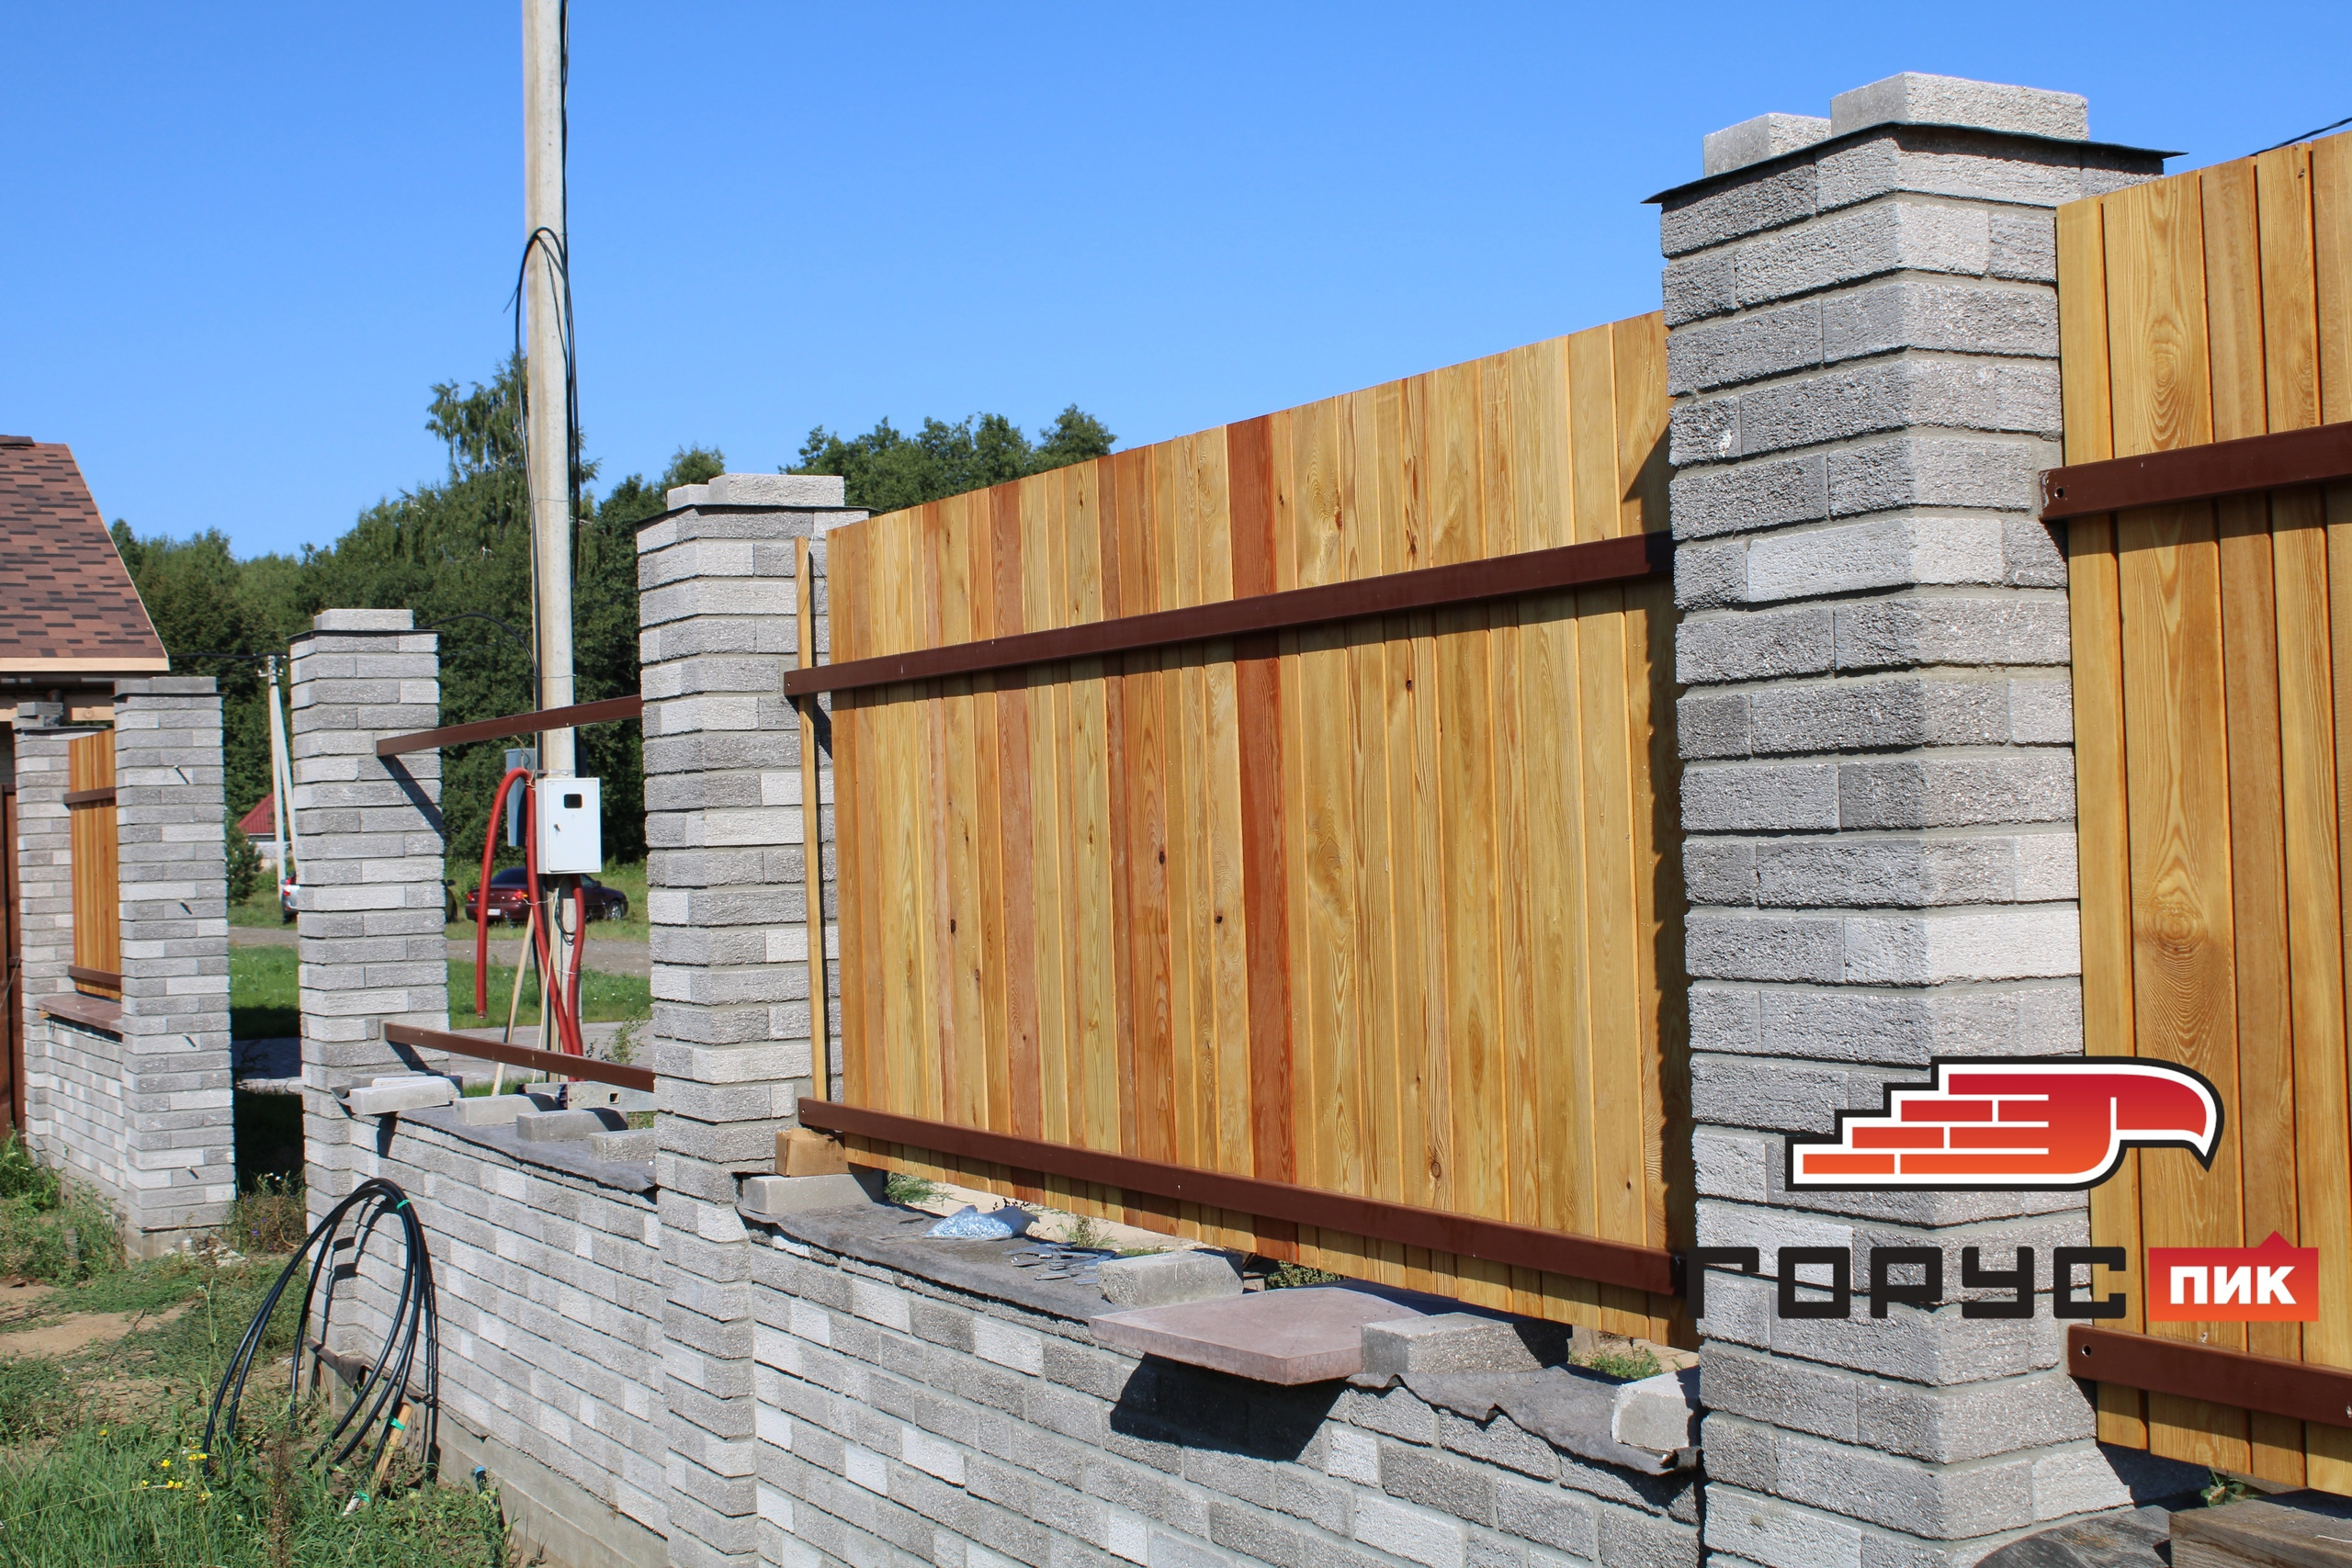 🏗Категория: забор.